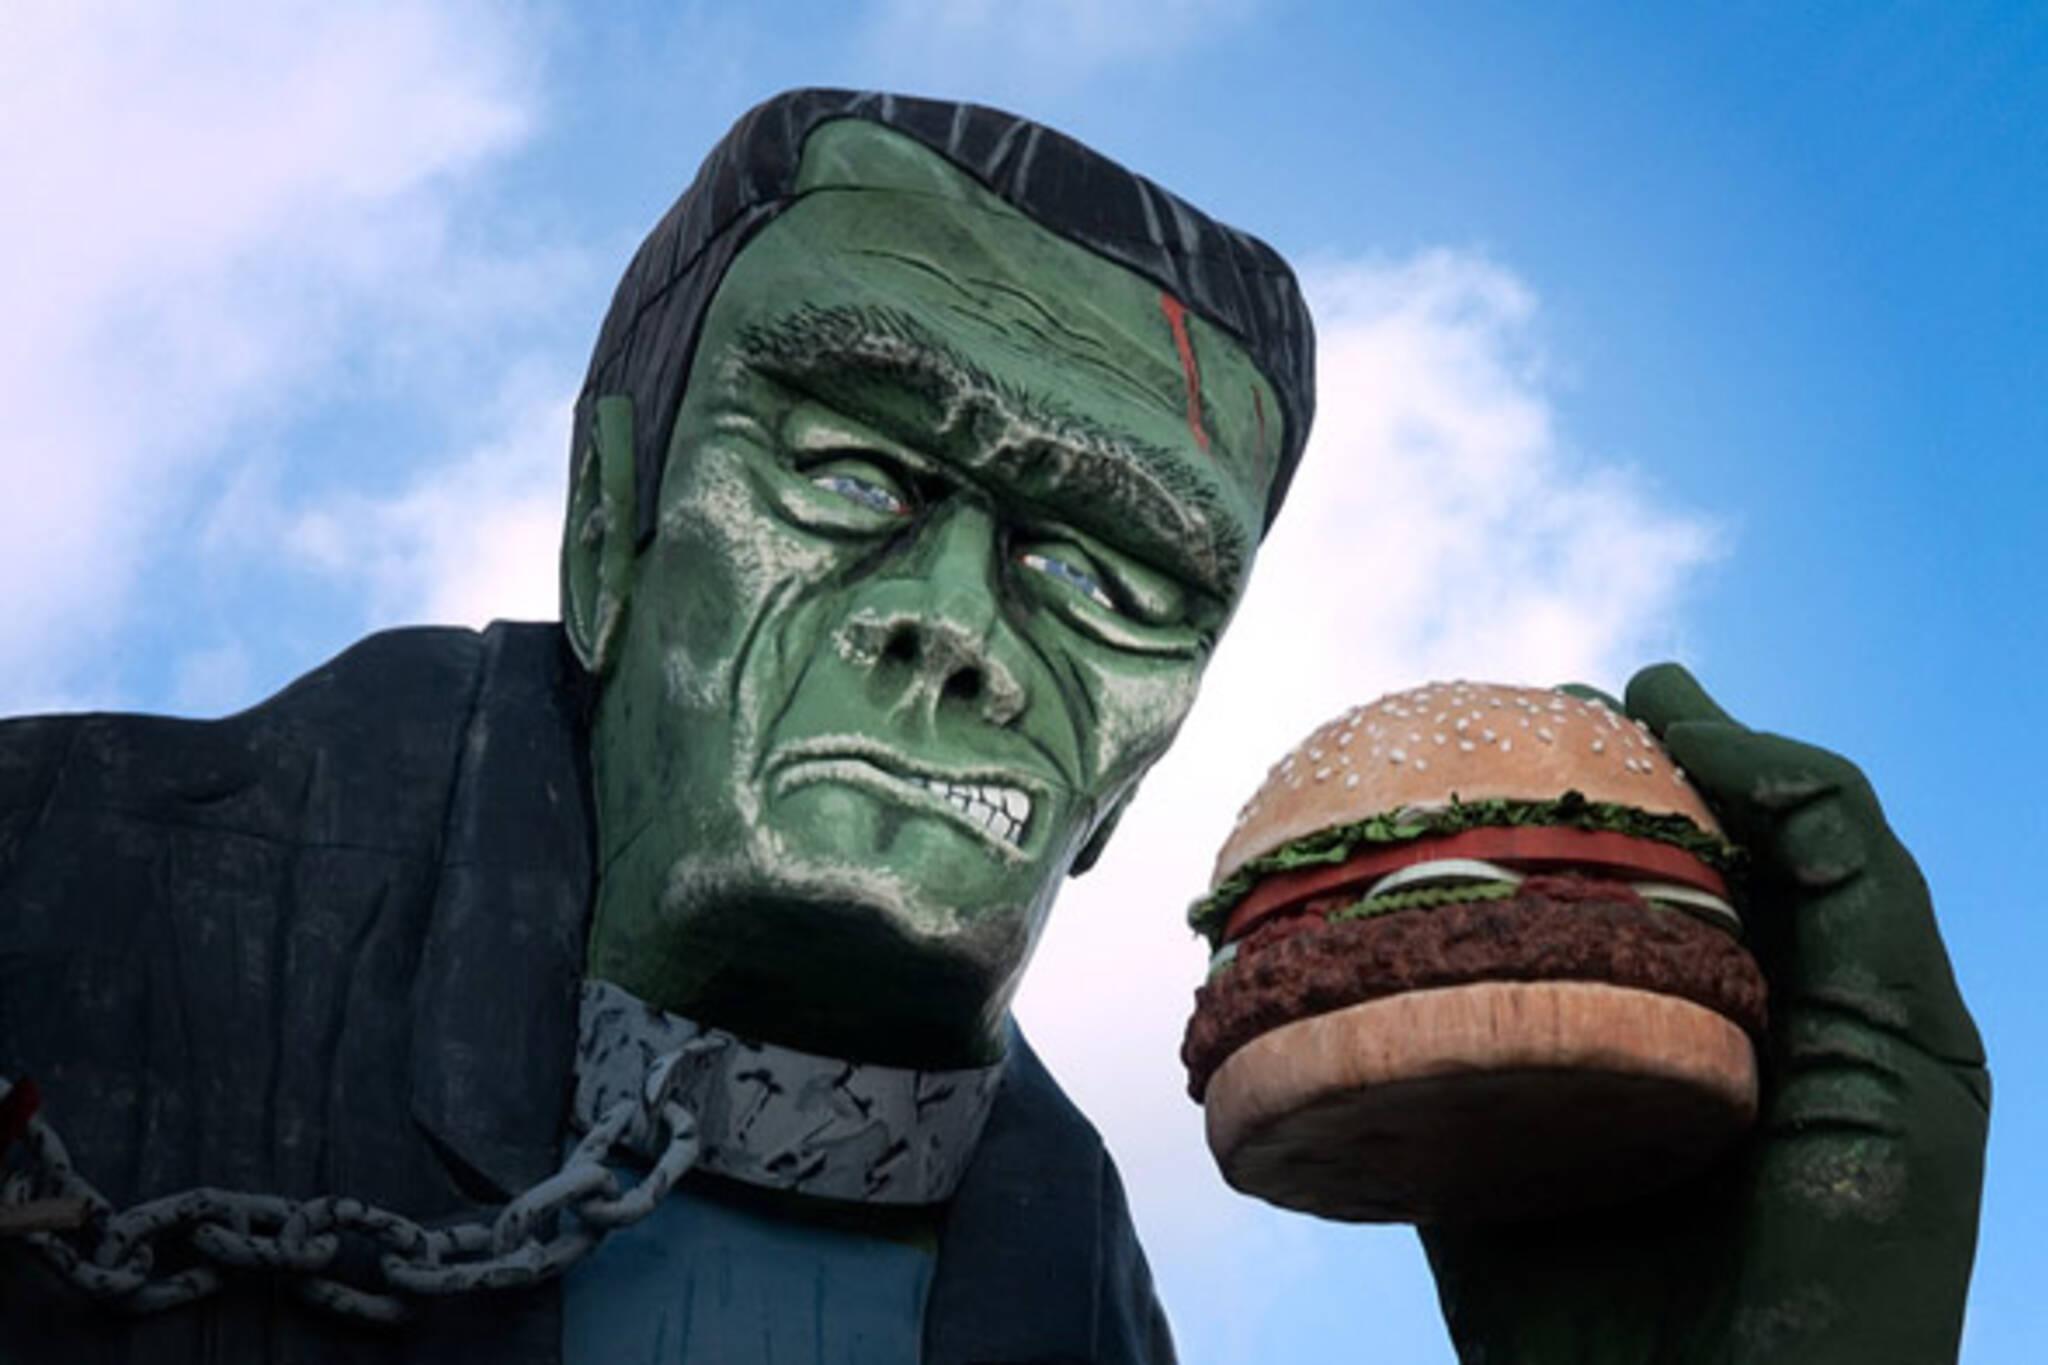 niagara falls frankenstein burger king